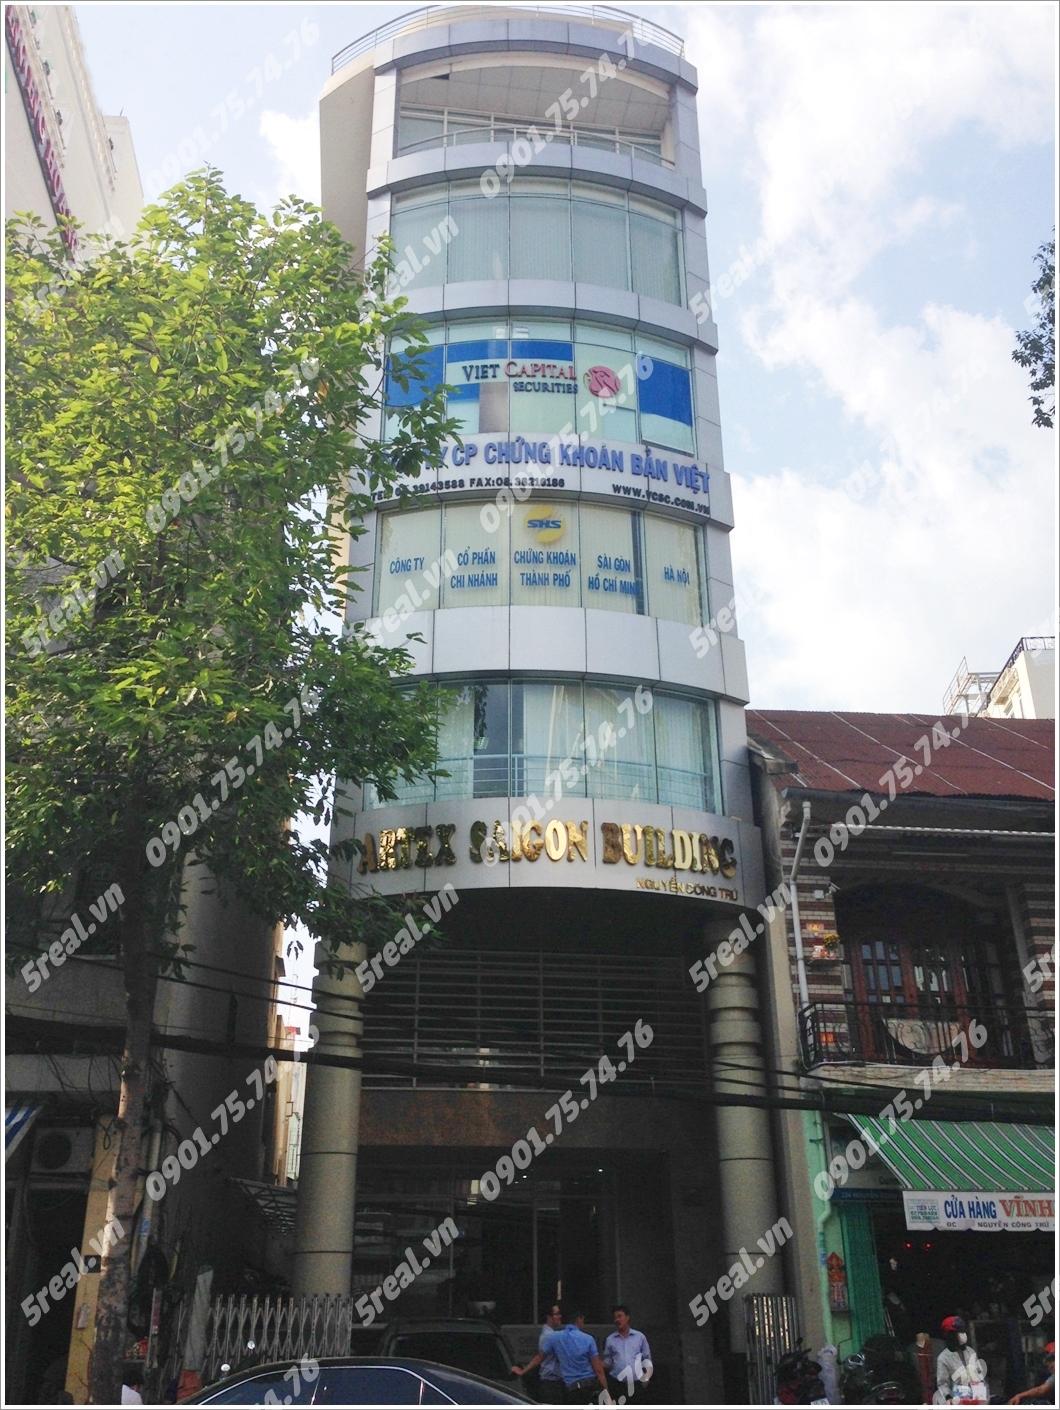 artex-saigon-building-nguyen-cong-tru-quan-1-van-phong-cho-thue-5real.vn-01